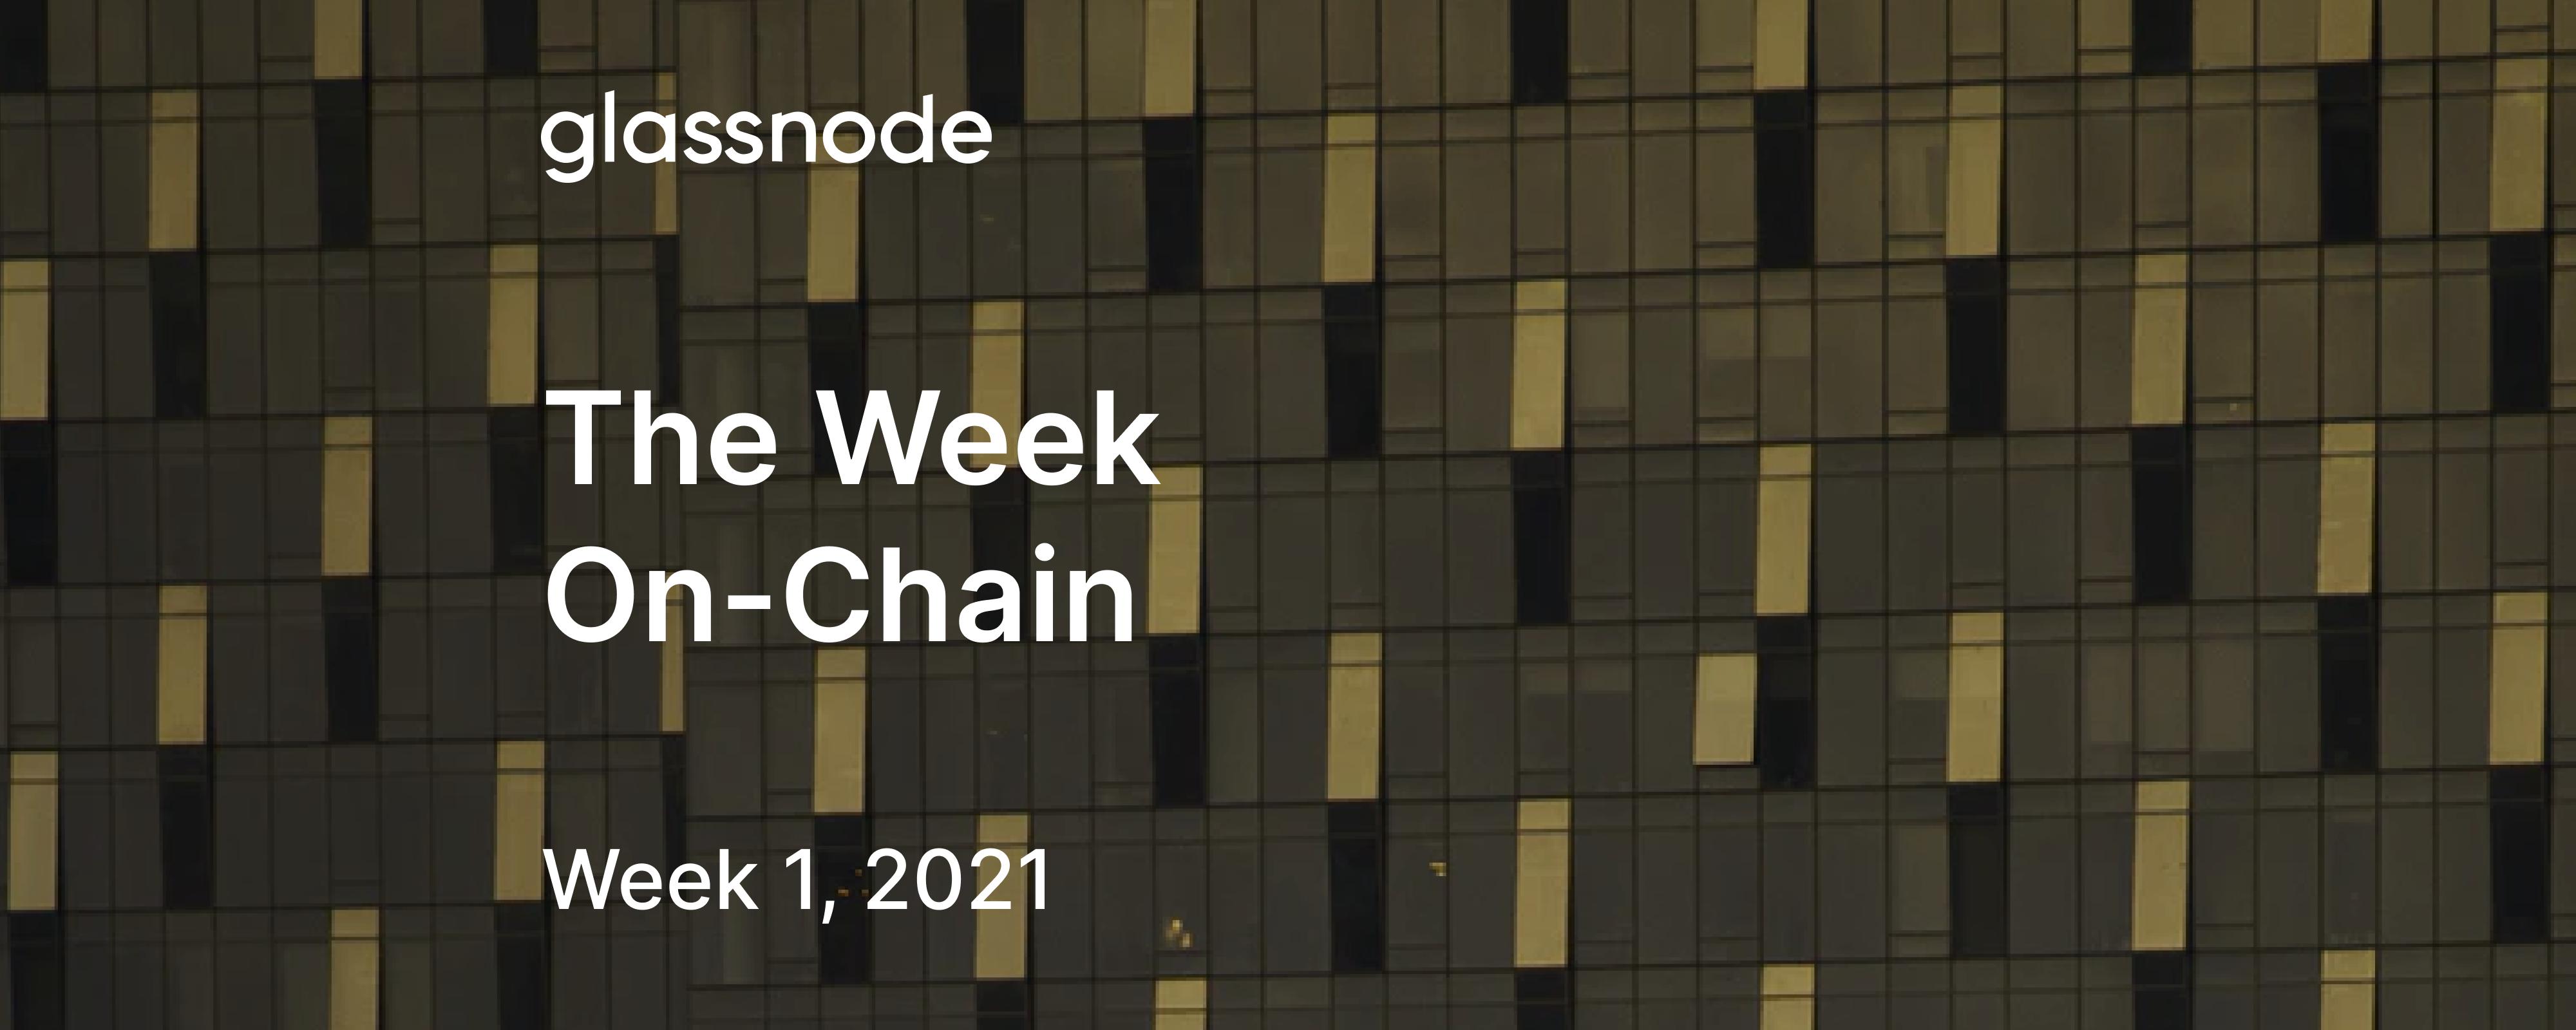 The Week On-Chain (Week 1, 2021)